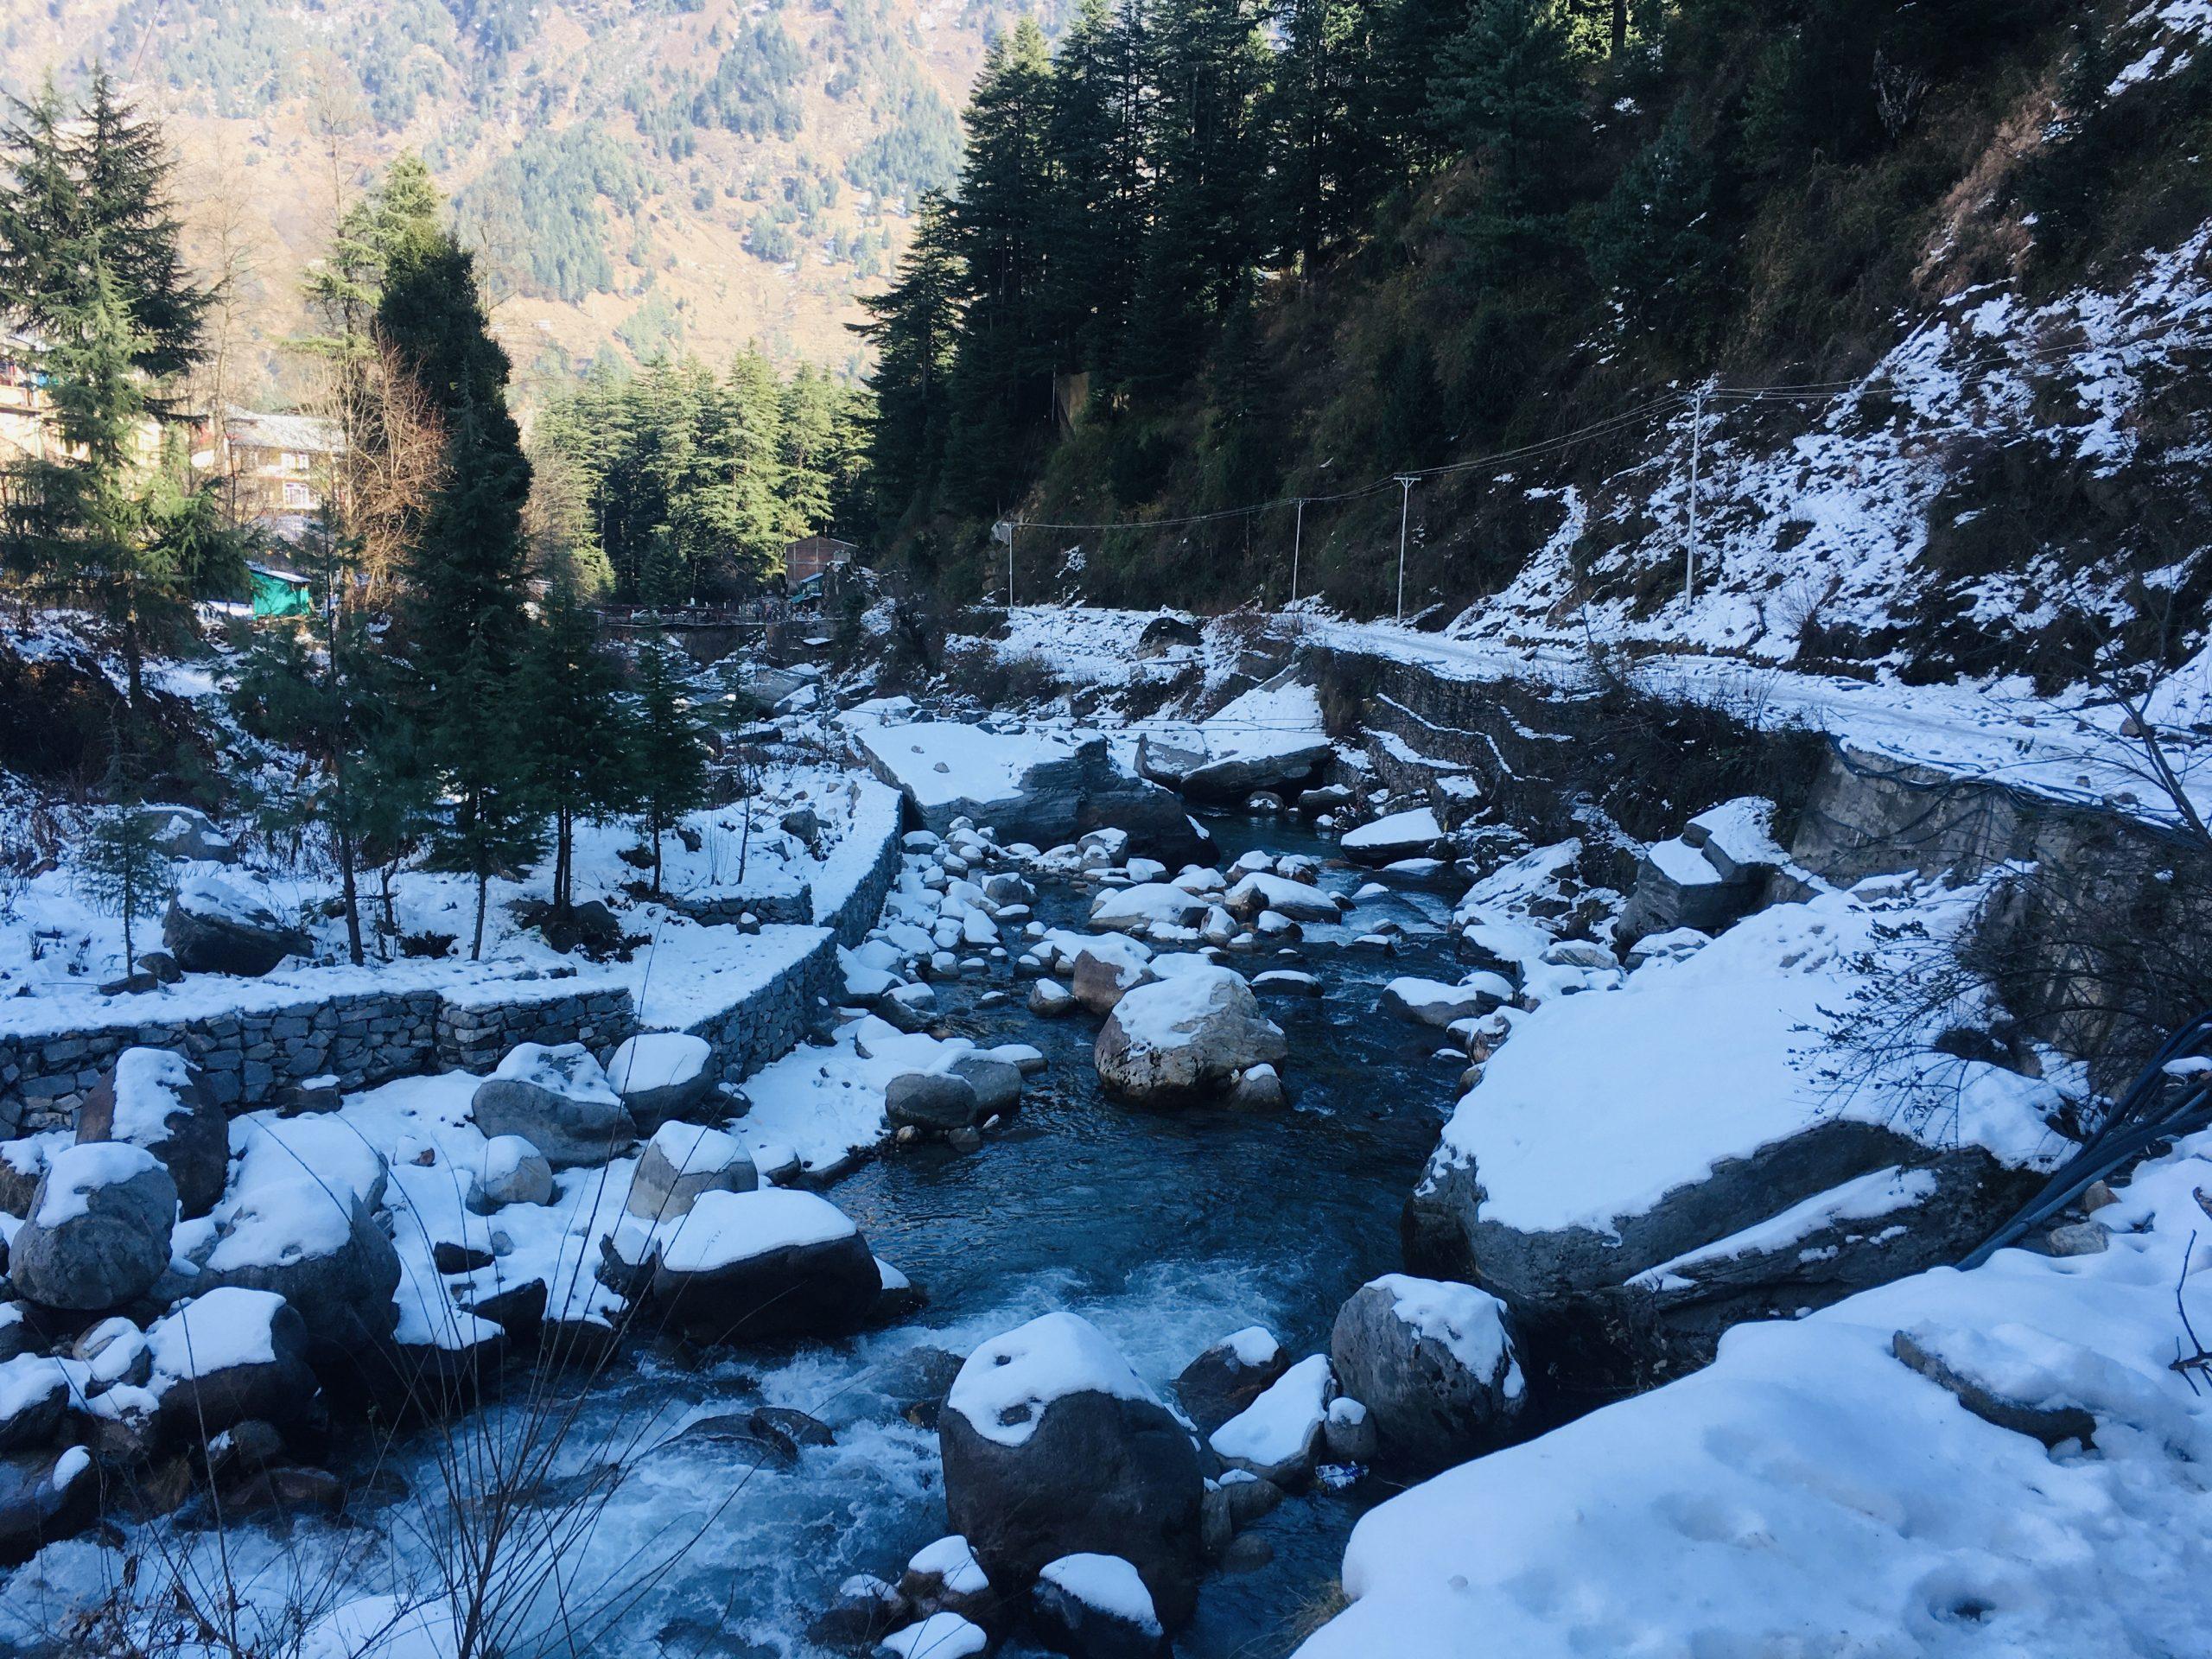 Snowy Beas river